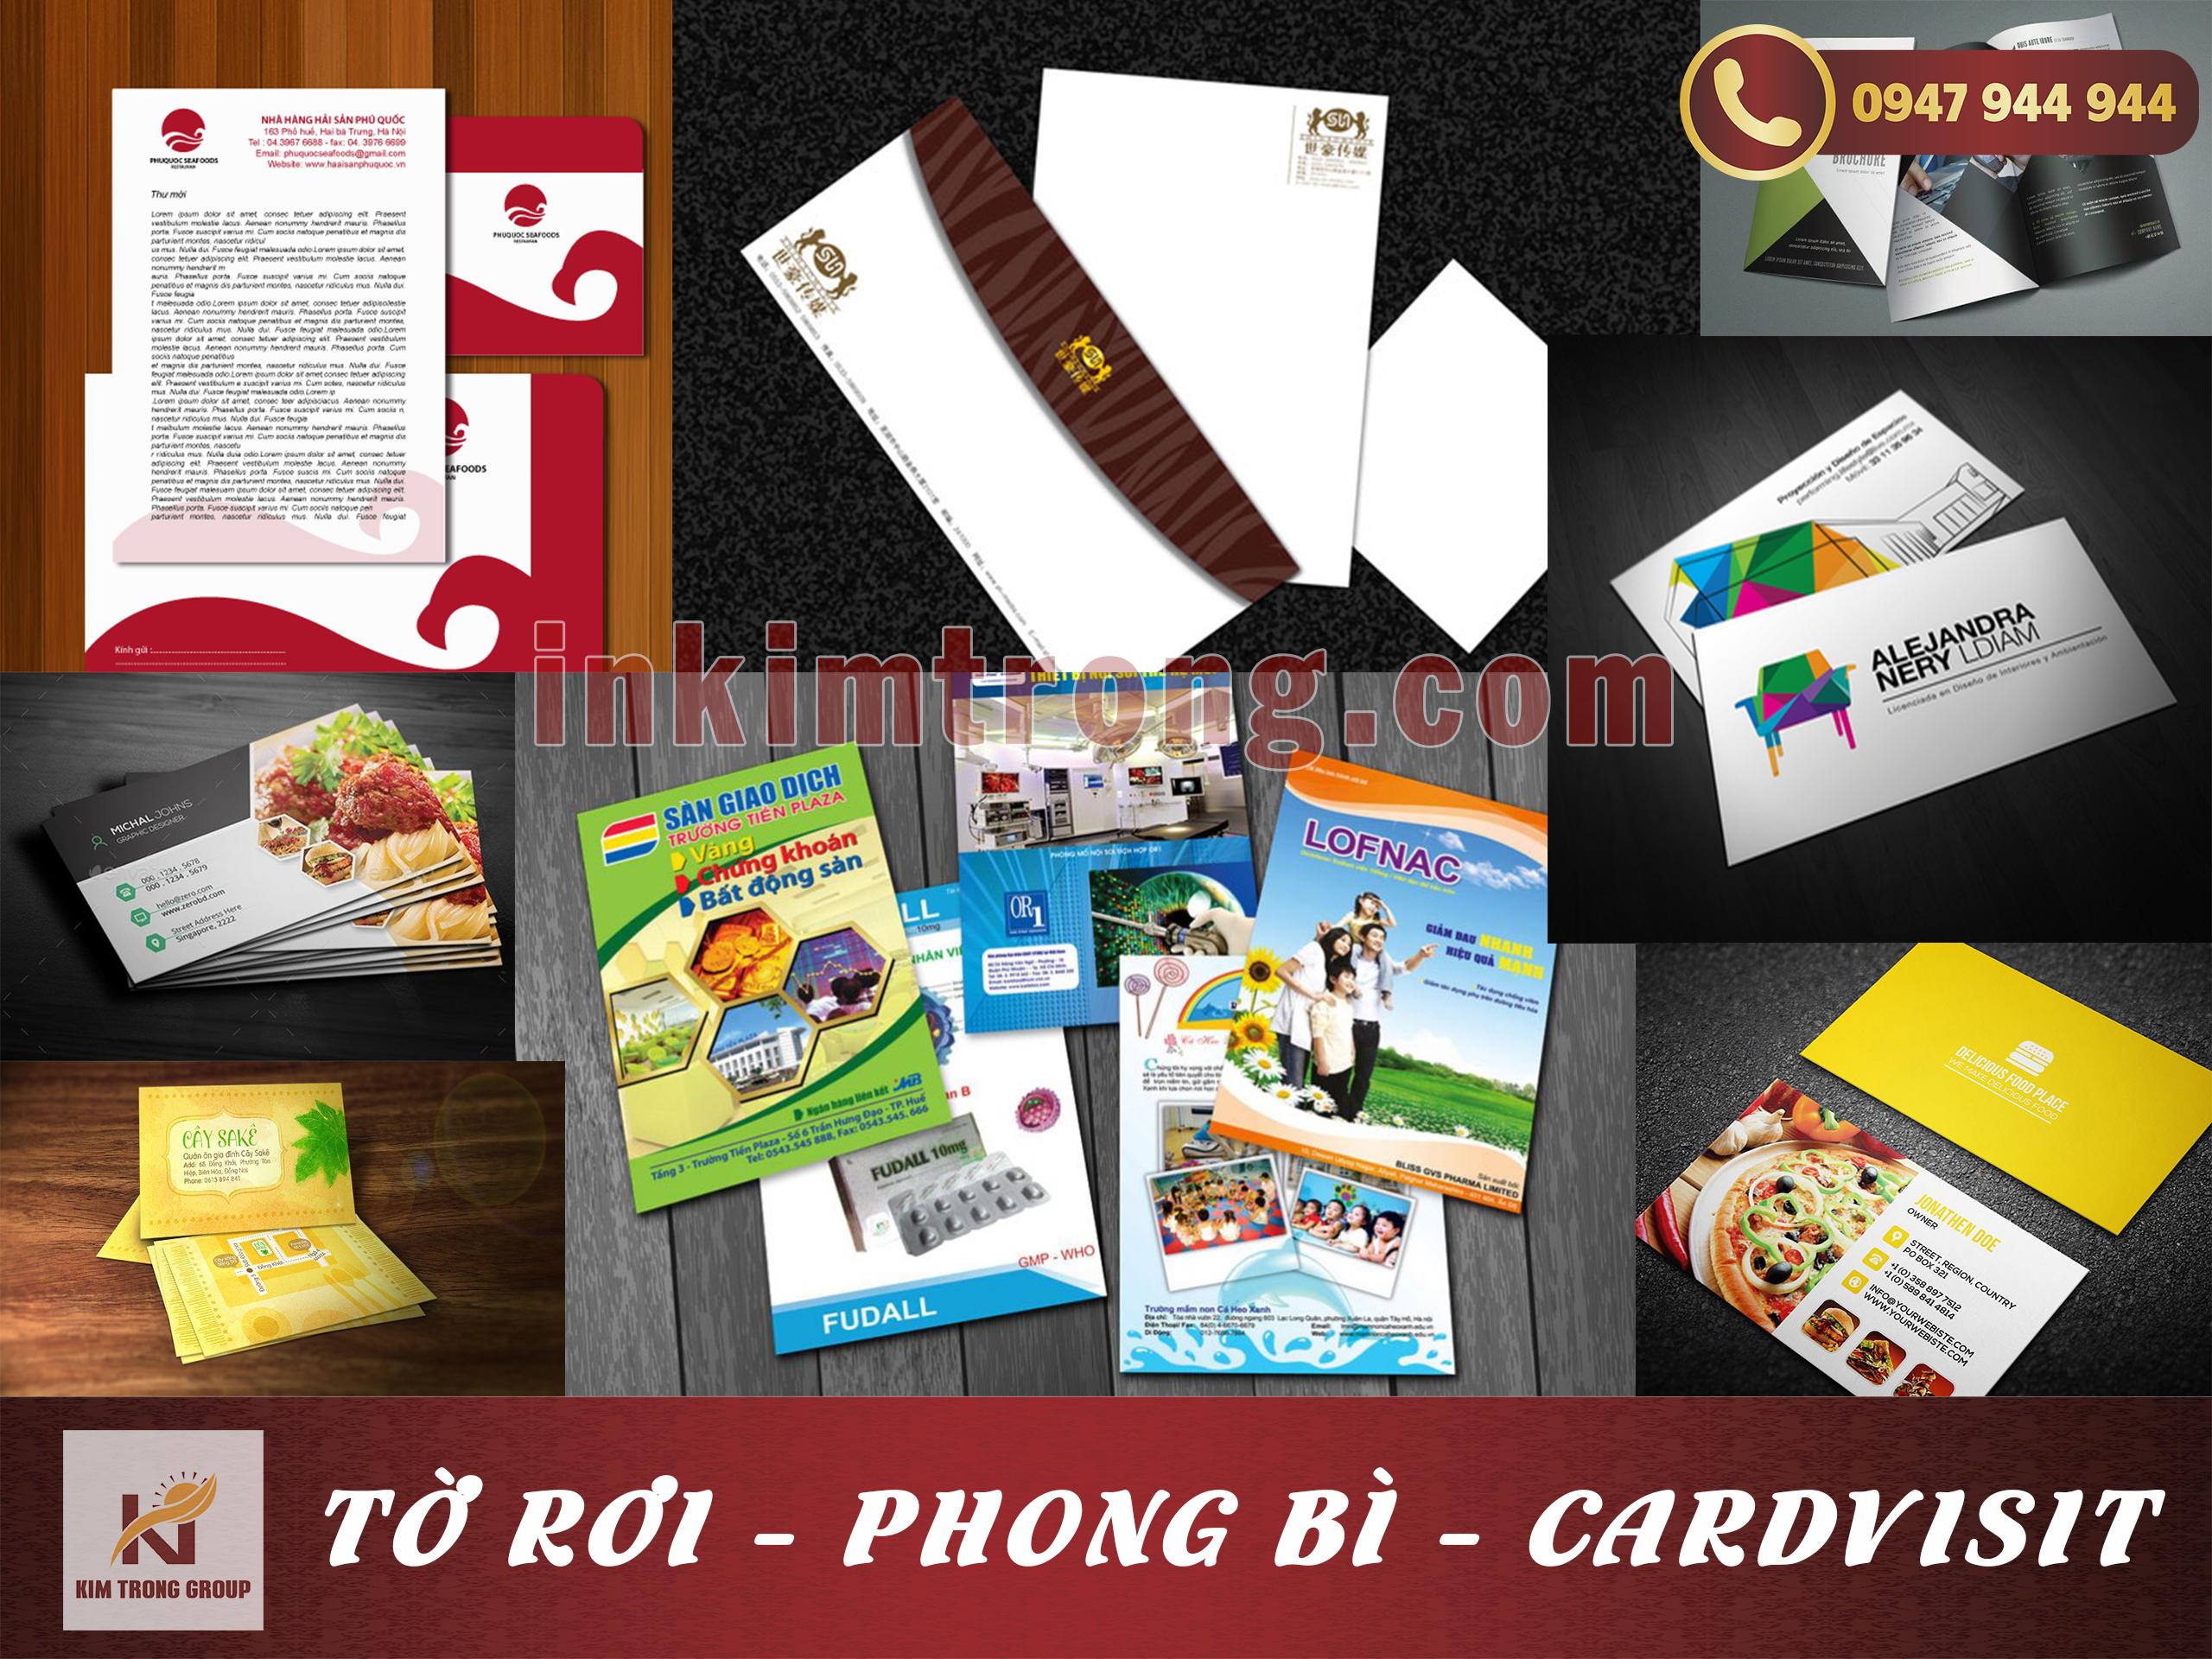 Cardvisit - Phong bì - Tờ rơi